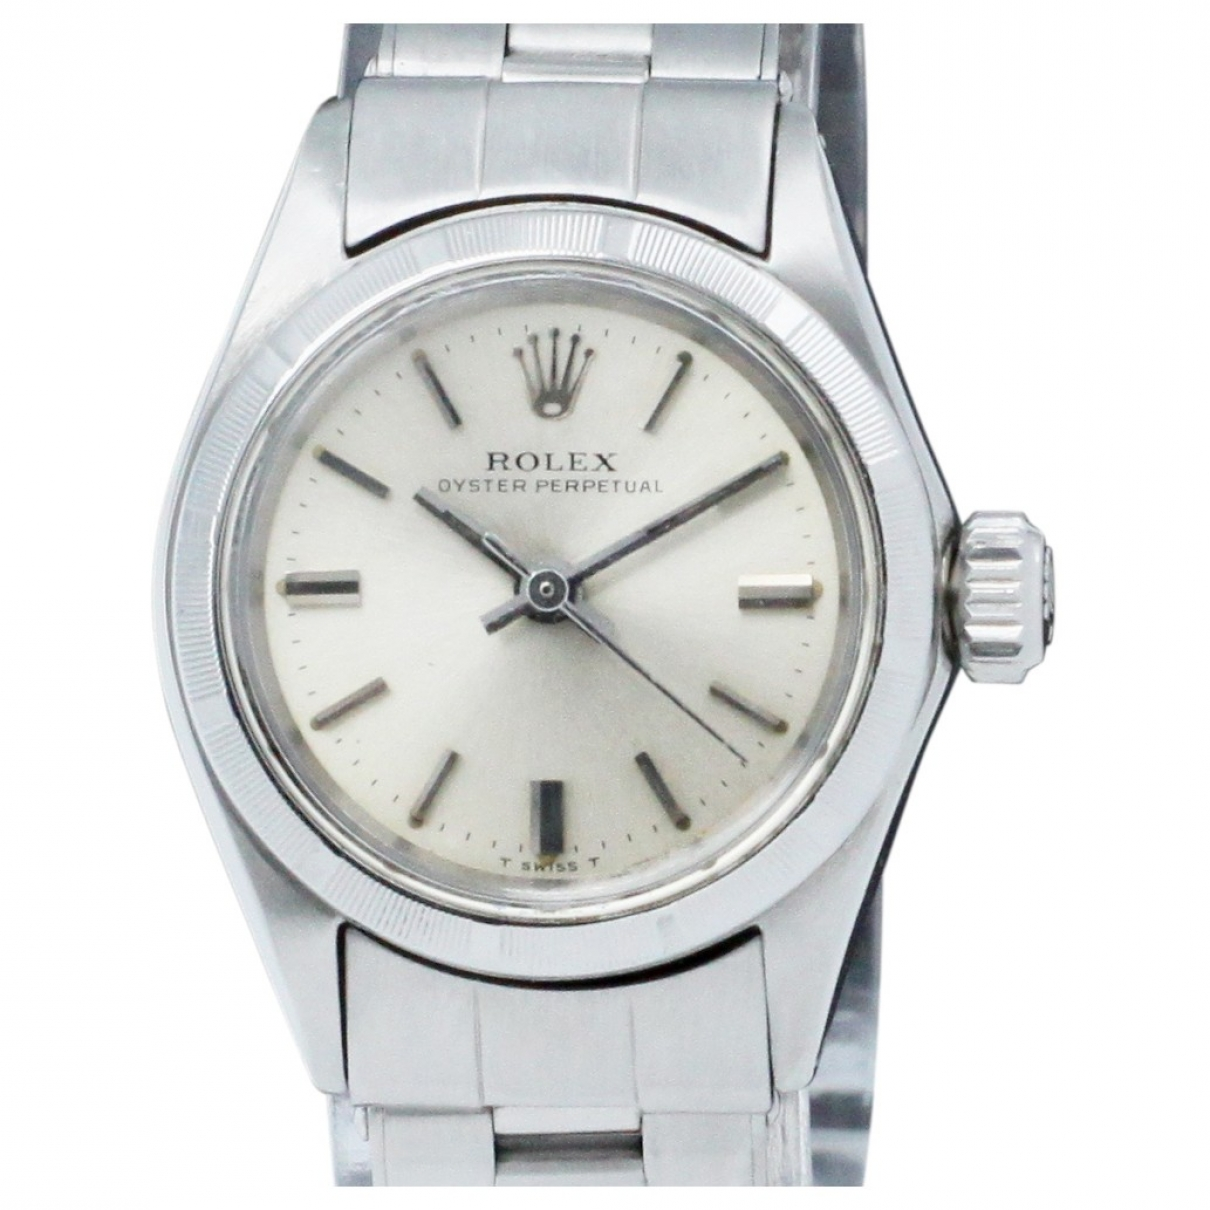 Rolex Lady Oyster Perpetual 26mm Silver Steel watch for Women \N